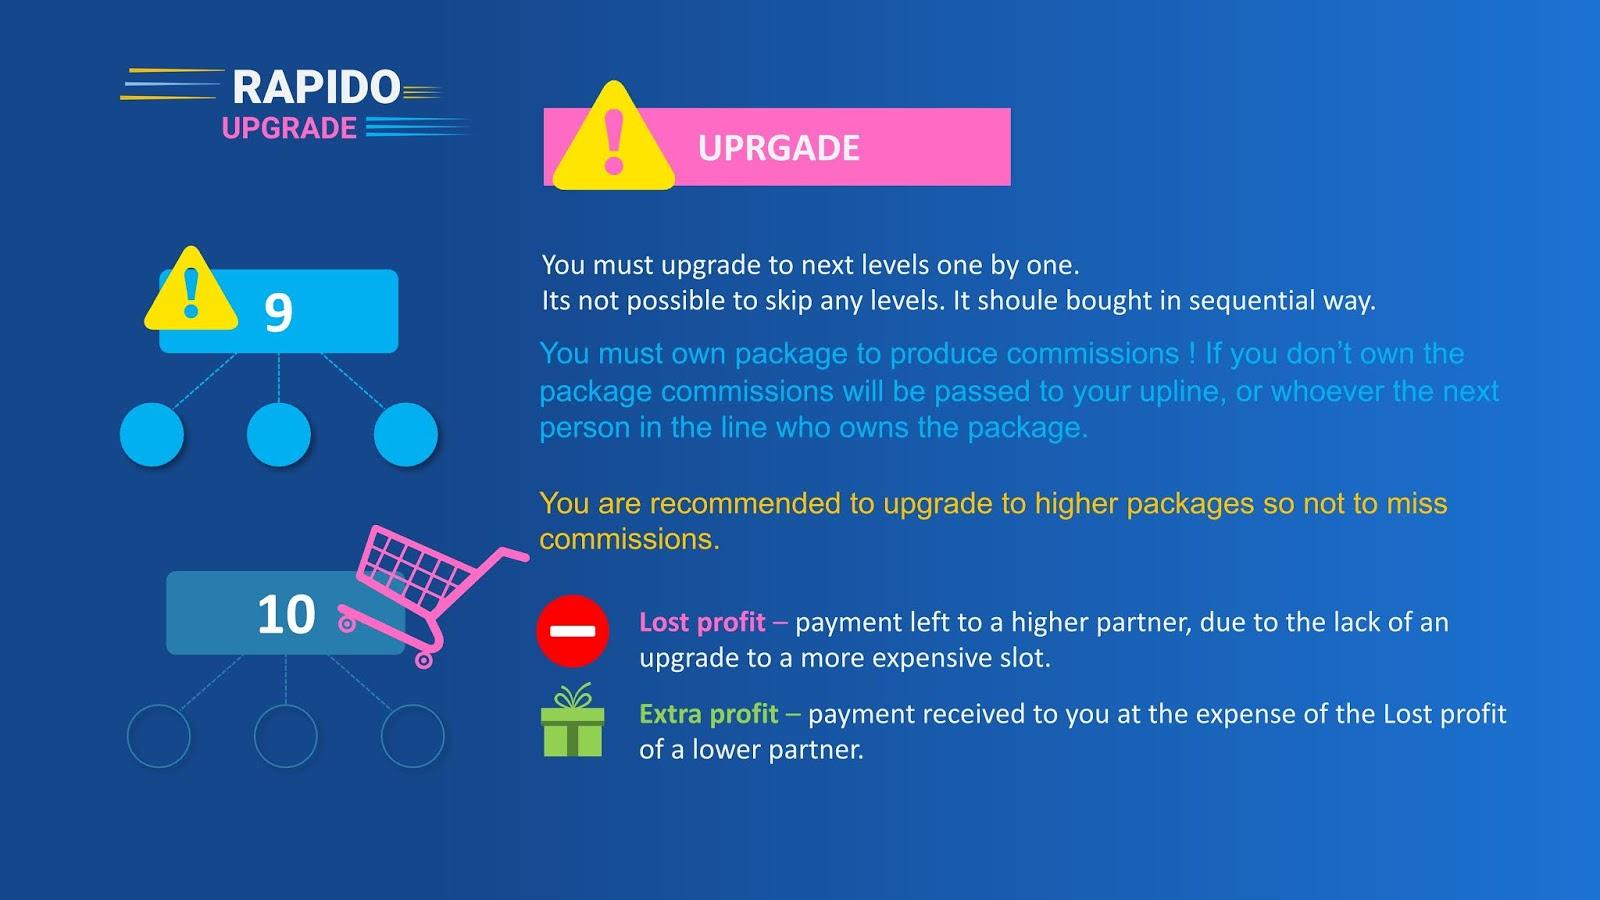 Upgrade Rapido smart contract